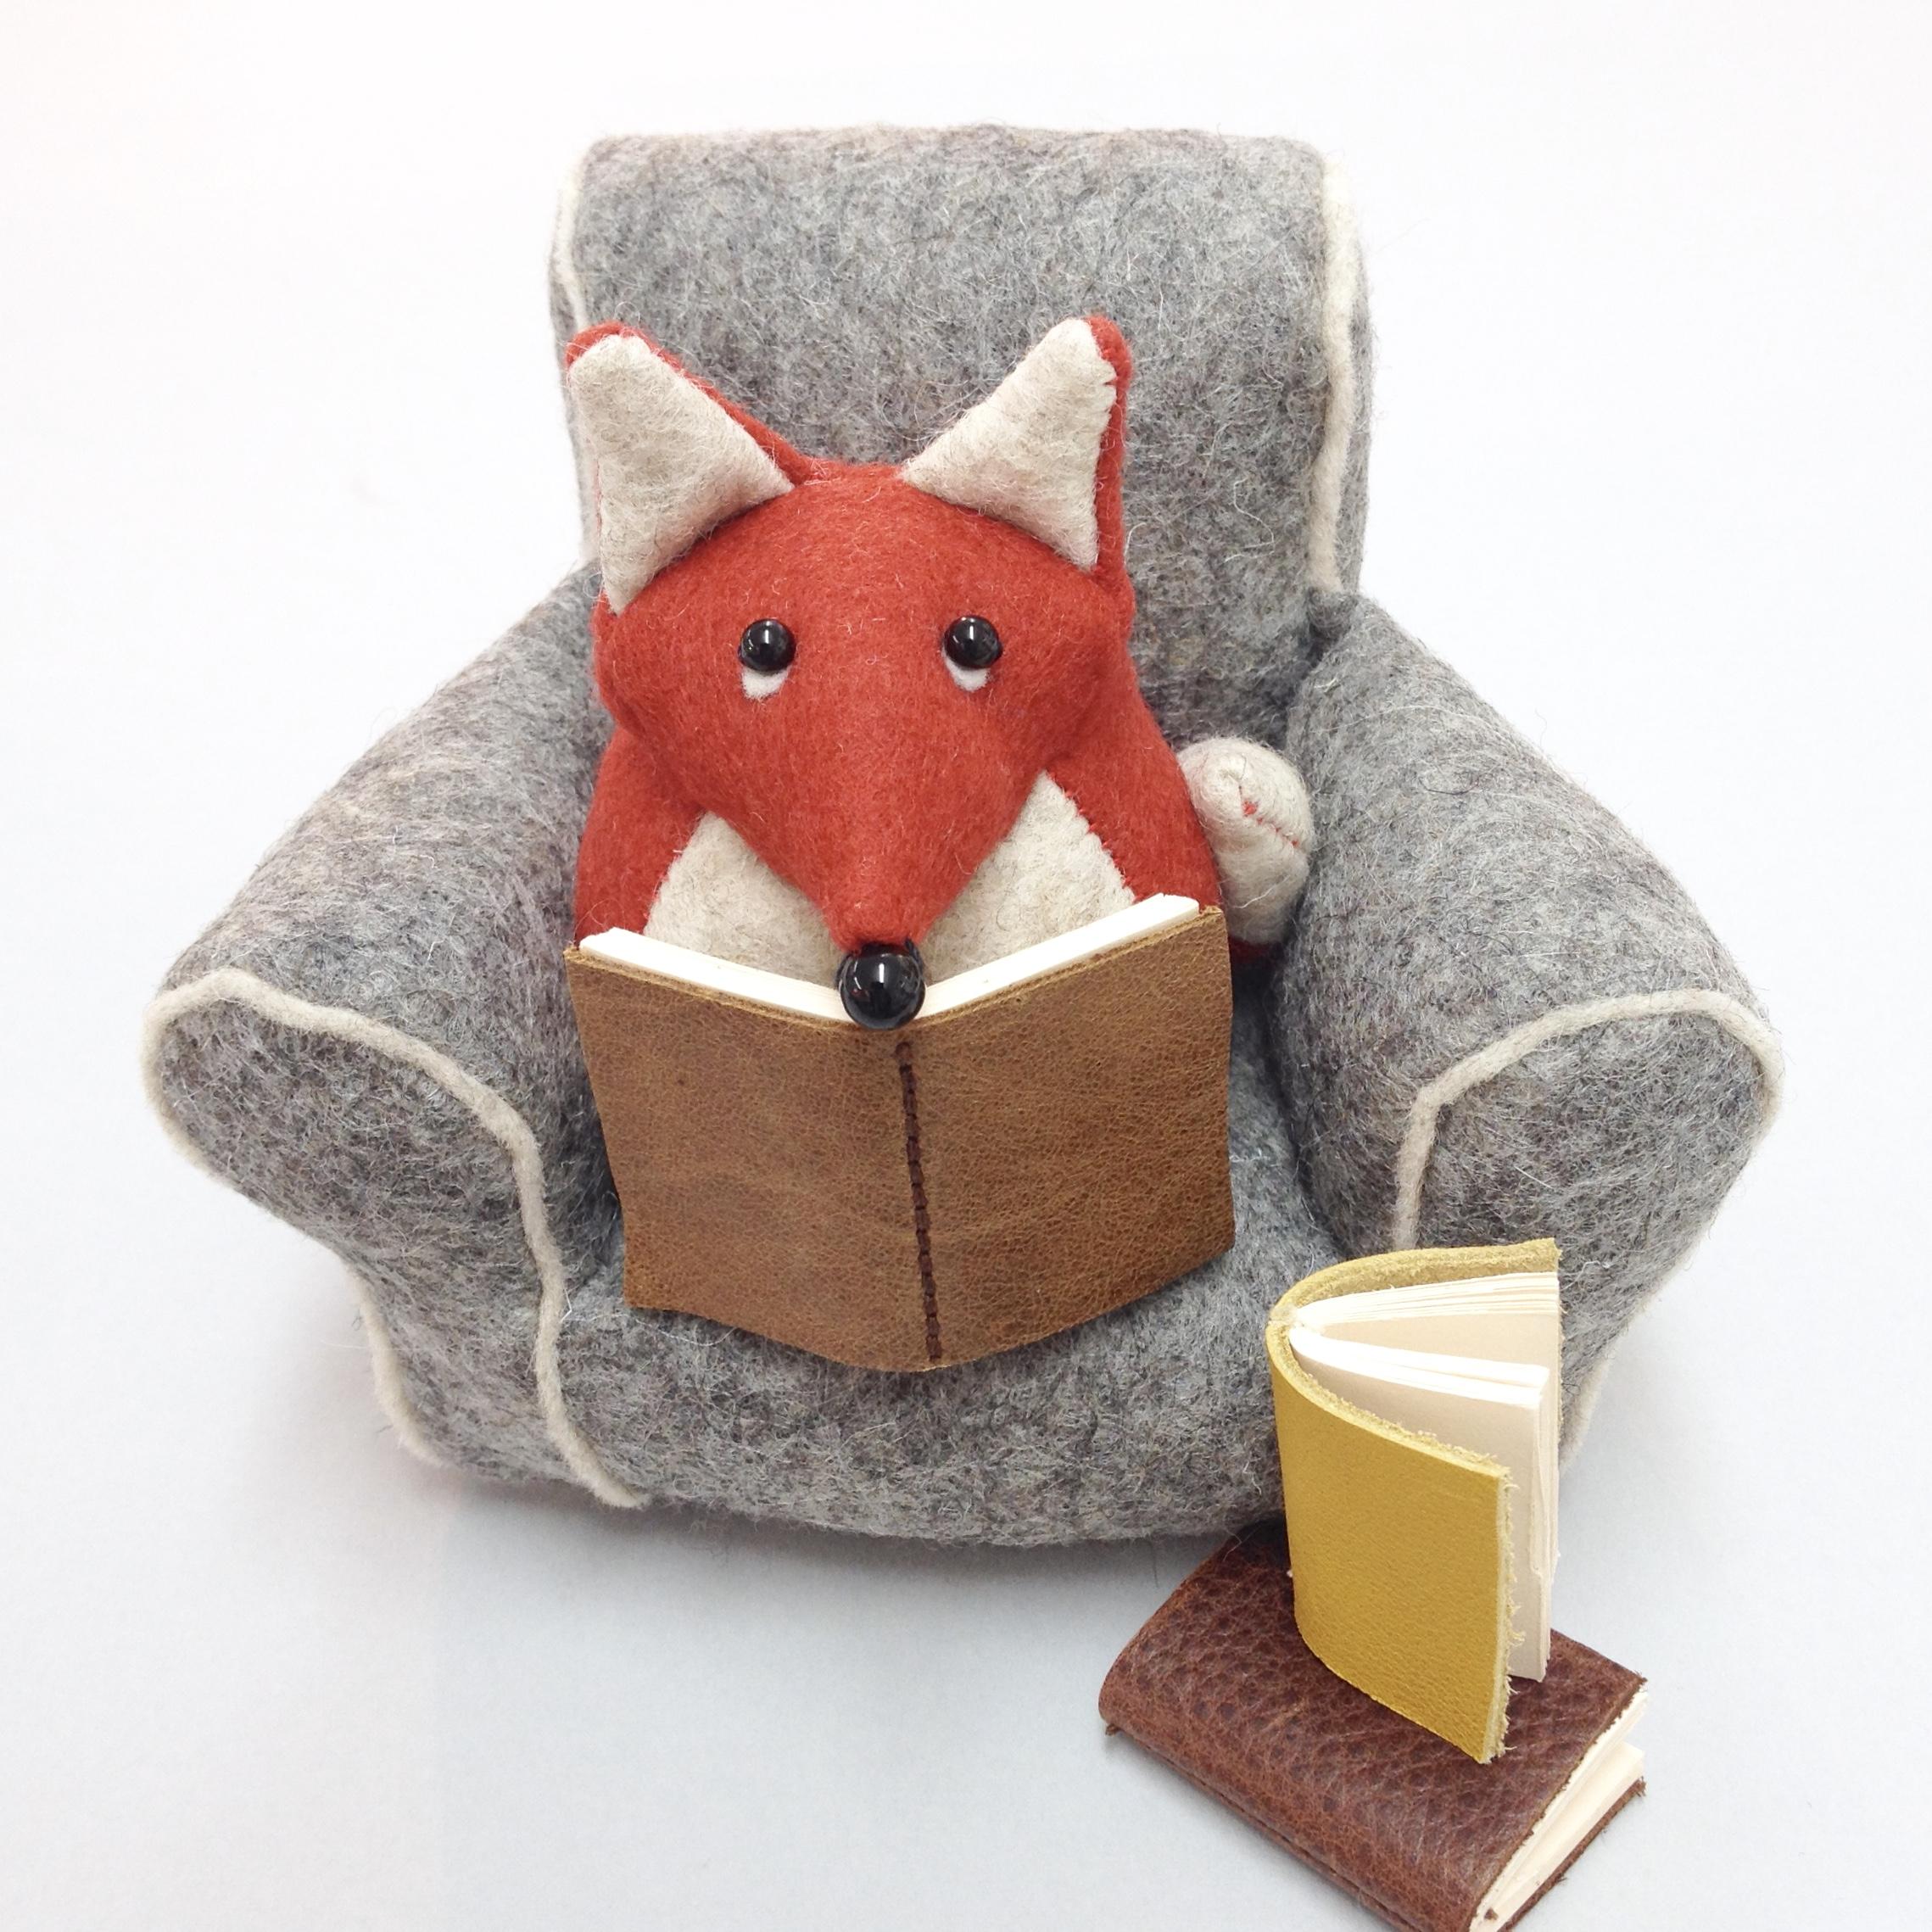 Bilberry Woods characters handmade by artist Laura Mirjami